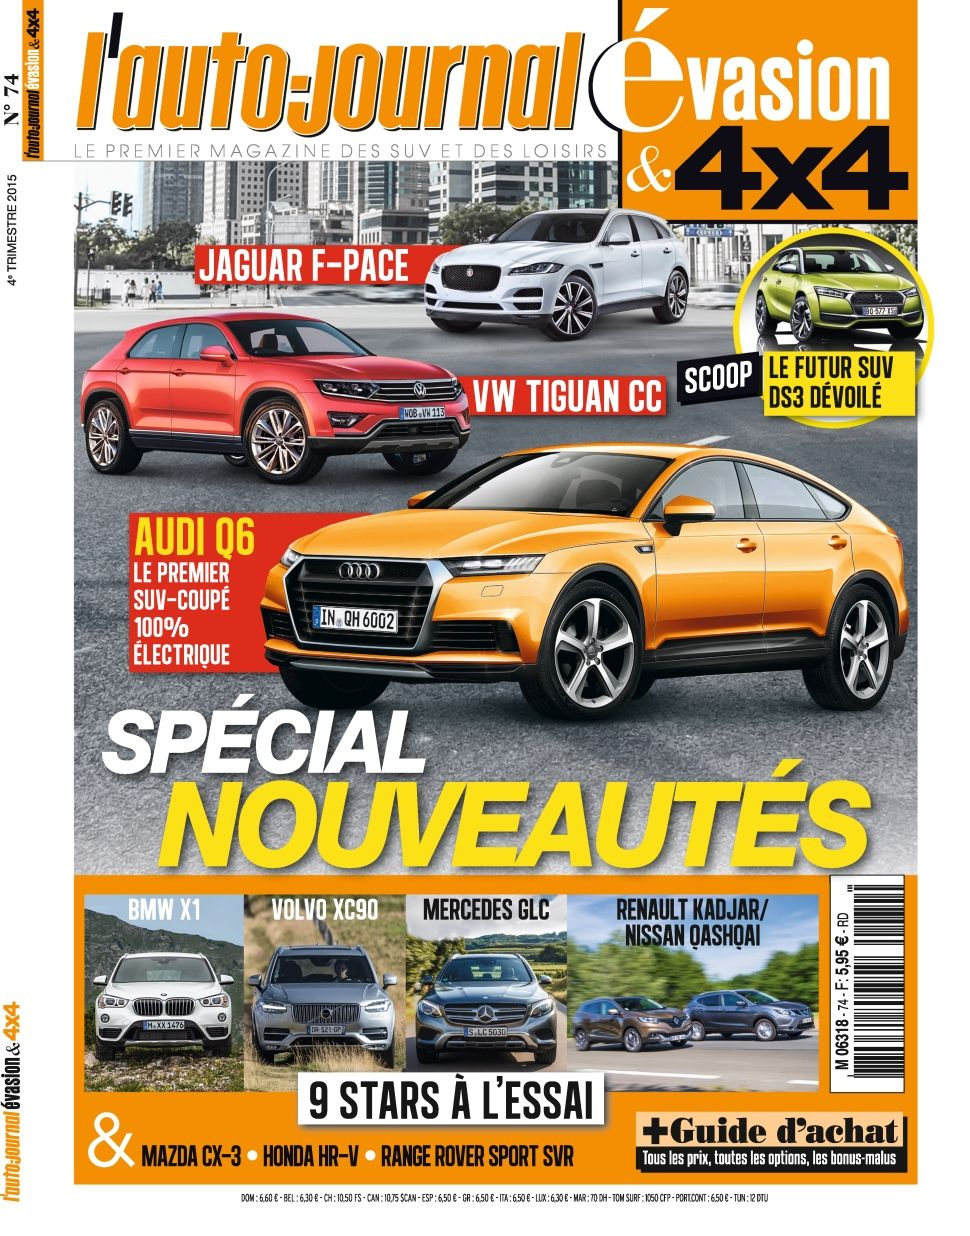 L'Auto-Journal 4x4 74 - Octobre-Decembre 2015